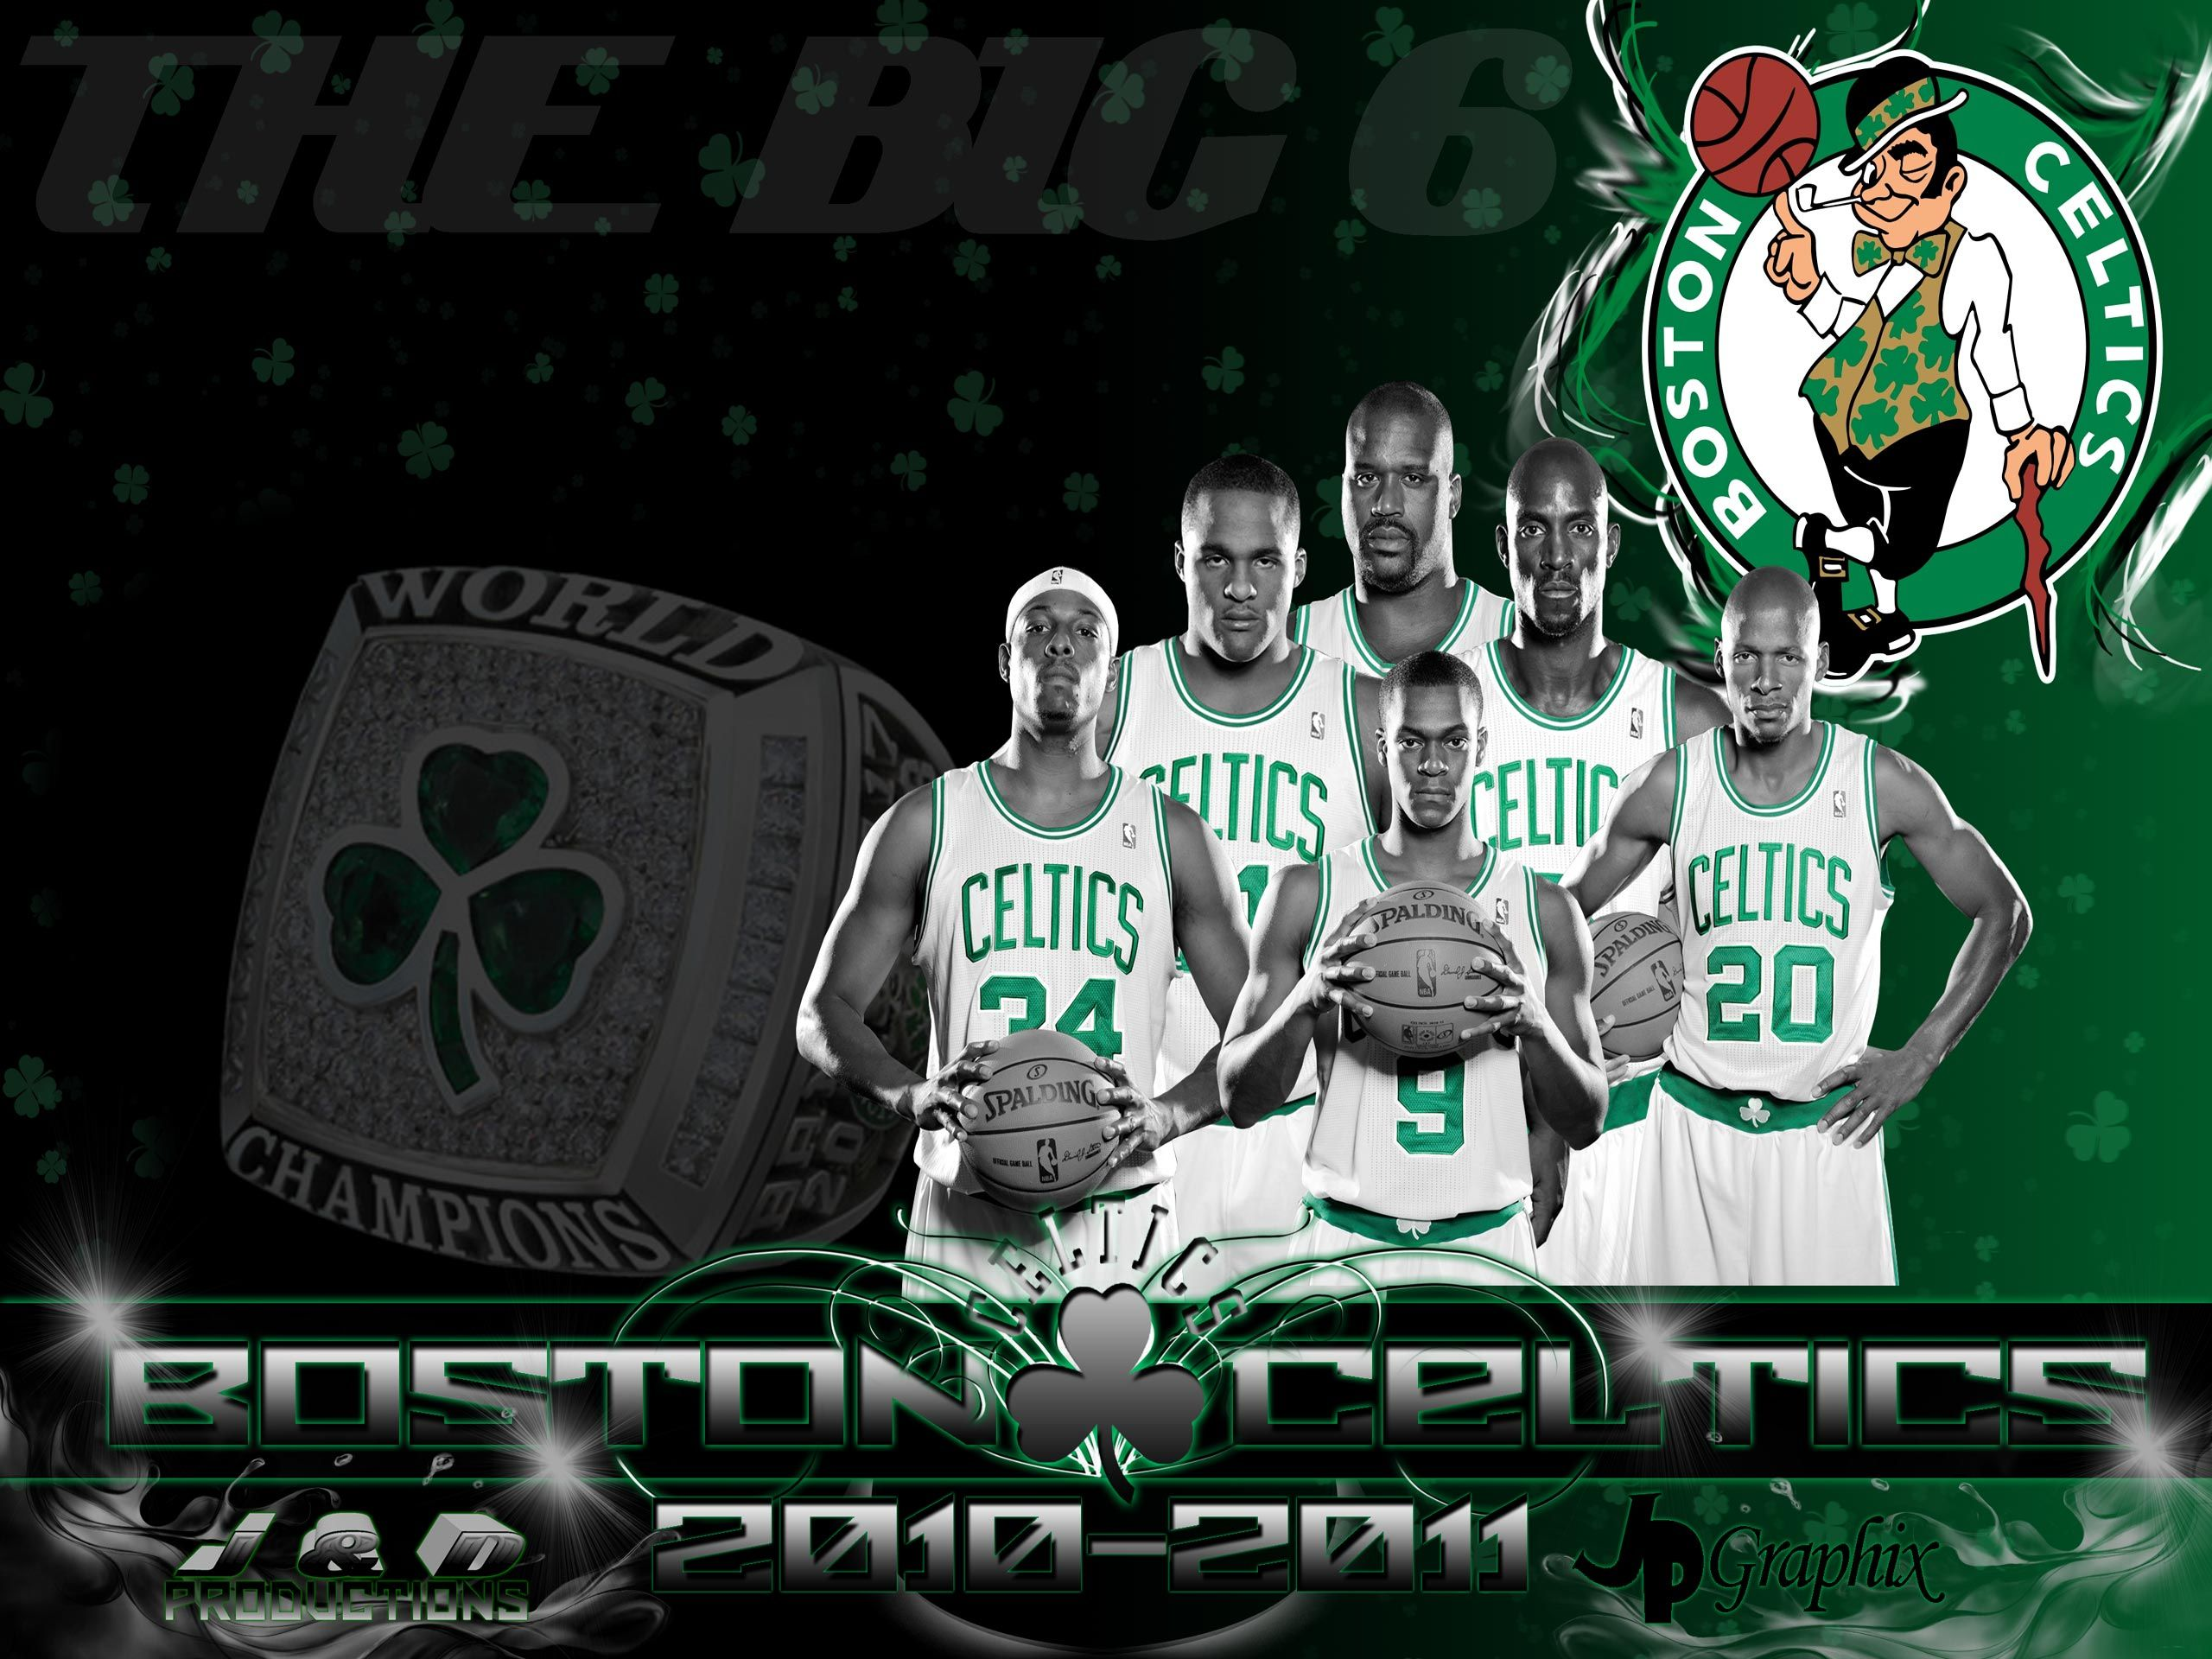 Nba Wallpaper Boston Celtics Best Wallpaper Hd Boston Celtics Wallpaper Basketball Wallpaper Boston Celtics